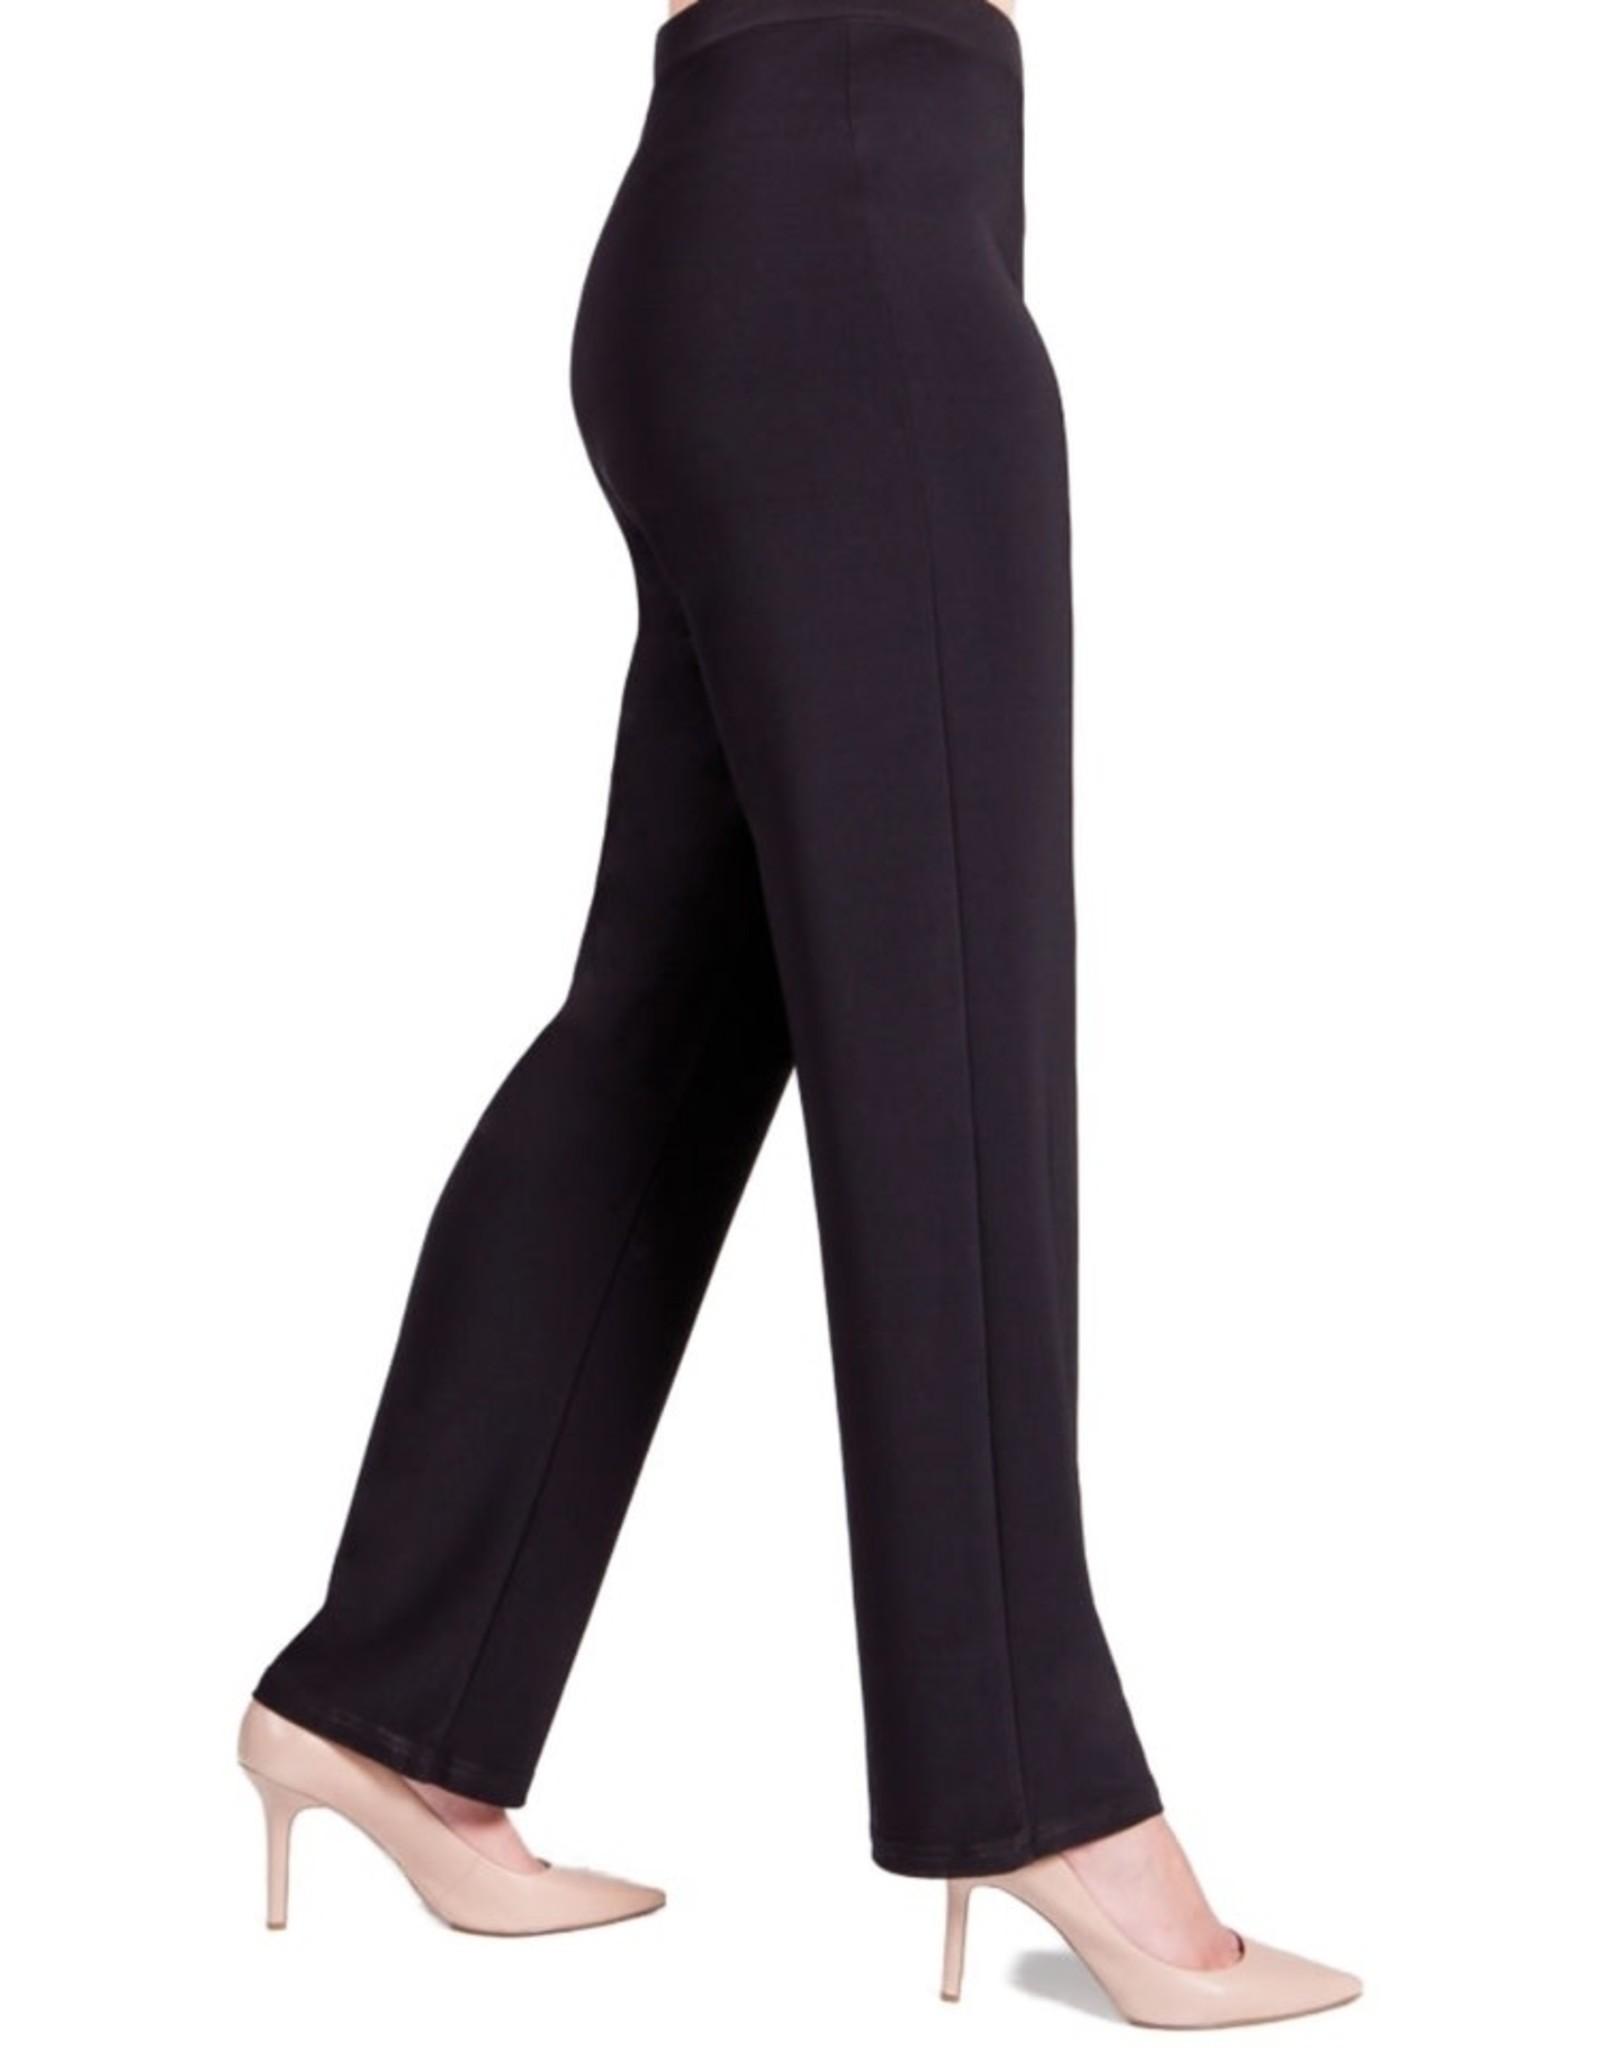 Sympli Essential Pant - Black